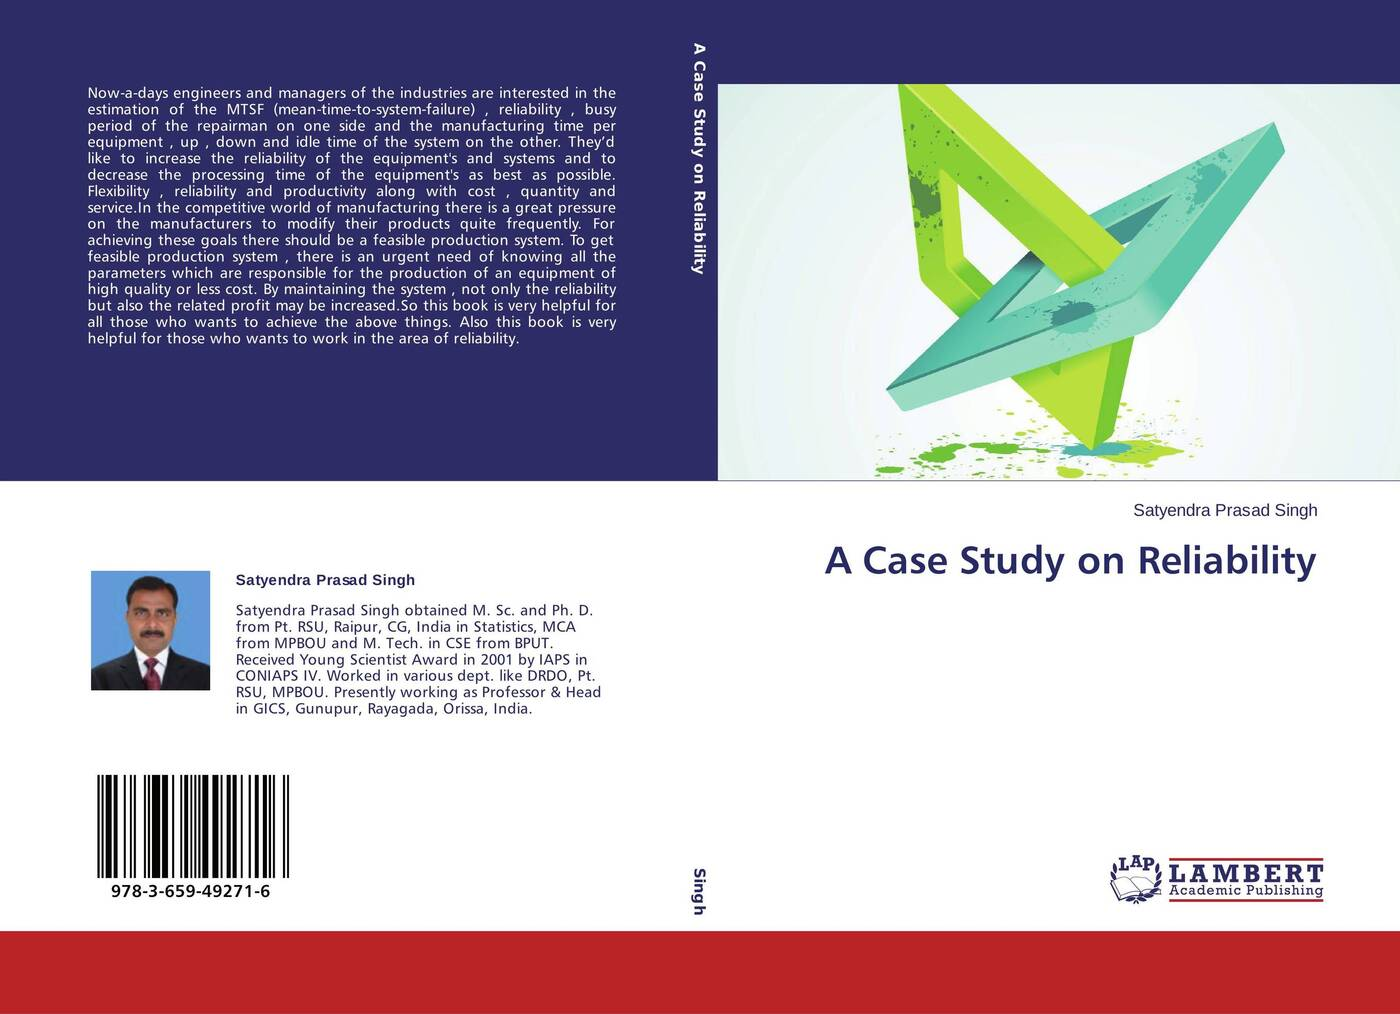 Satyendra Prasad Singh A Case Study on Reliability